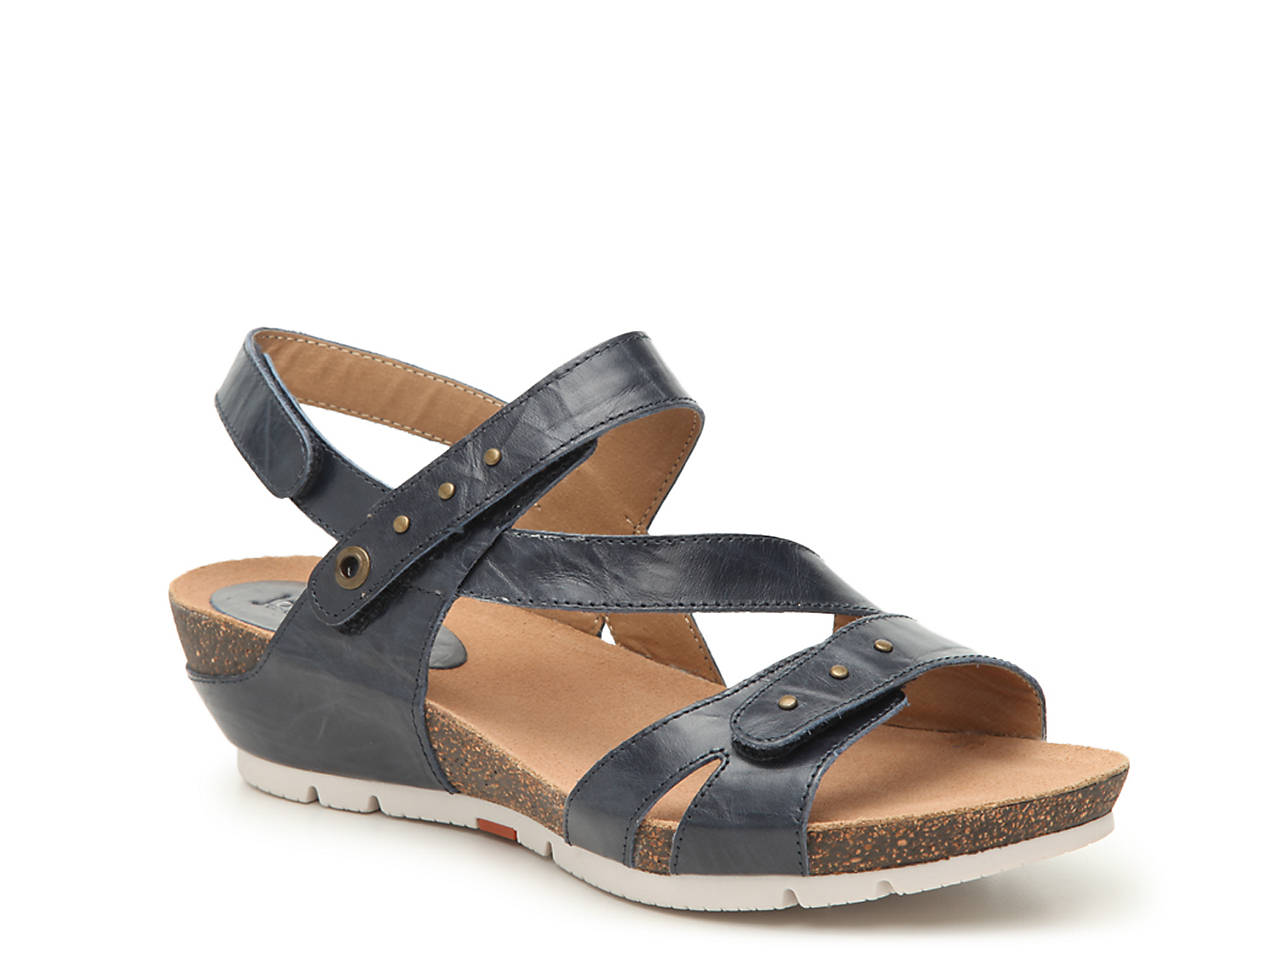 0ed820d72199 Josef Seibel Hailey Wedge Sandal Women s Shoes